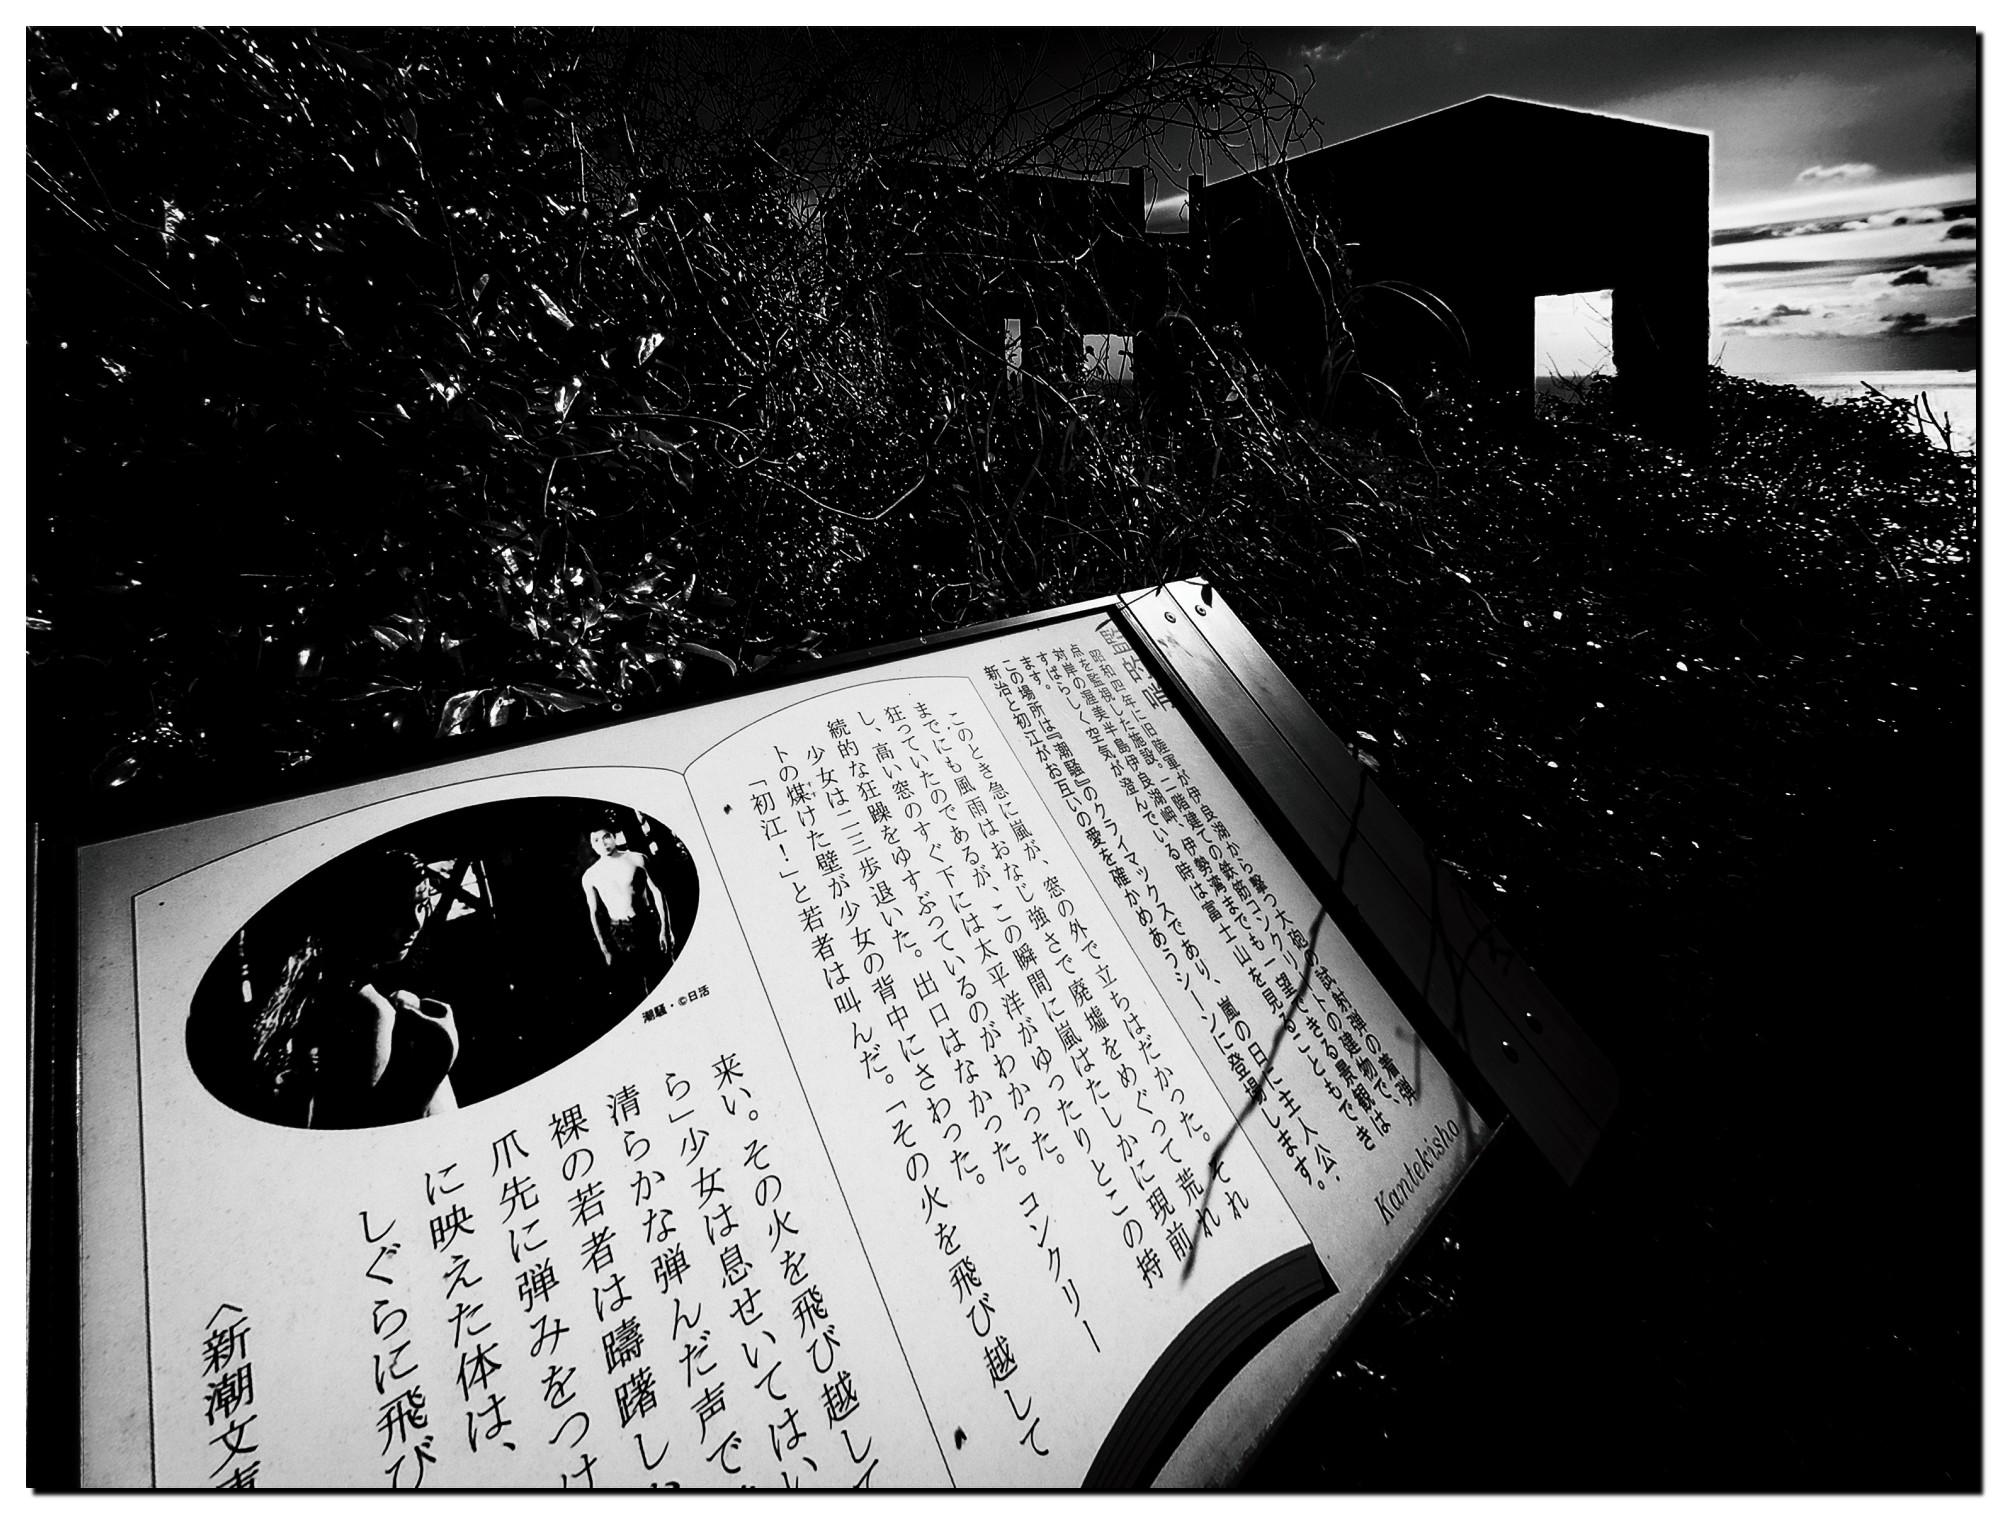 01LR-P1268331-Edit-3.jpg